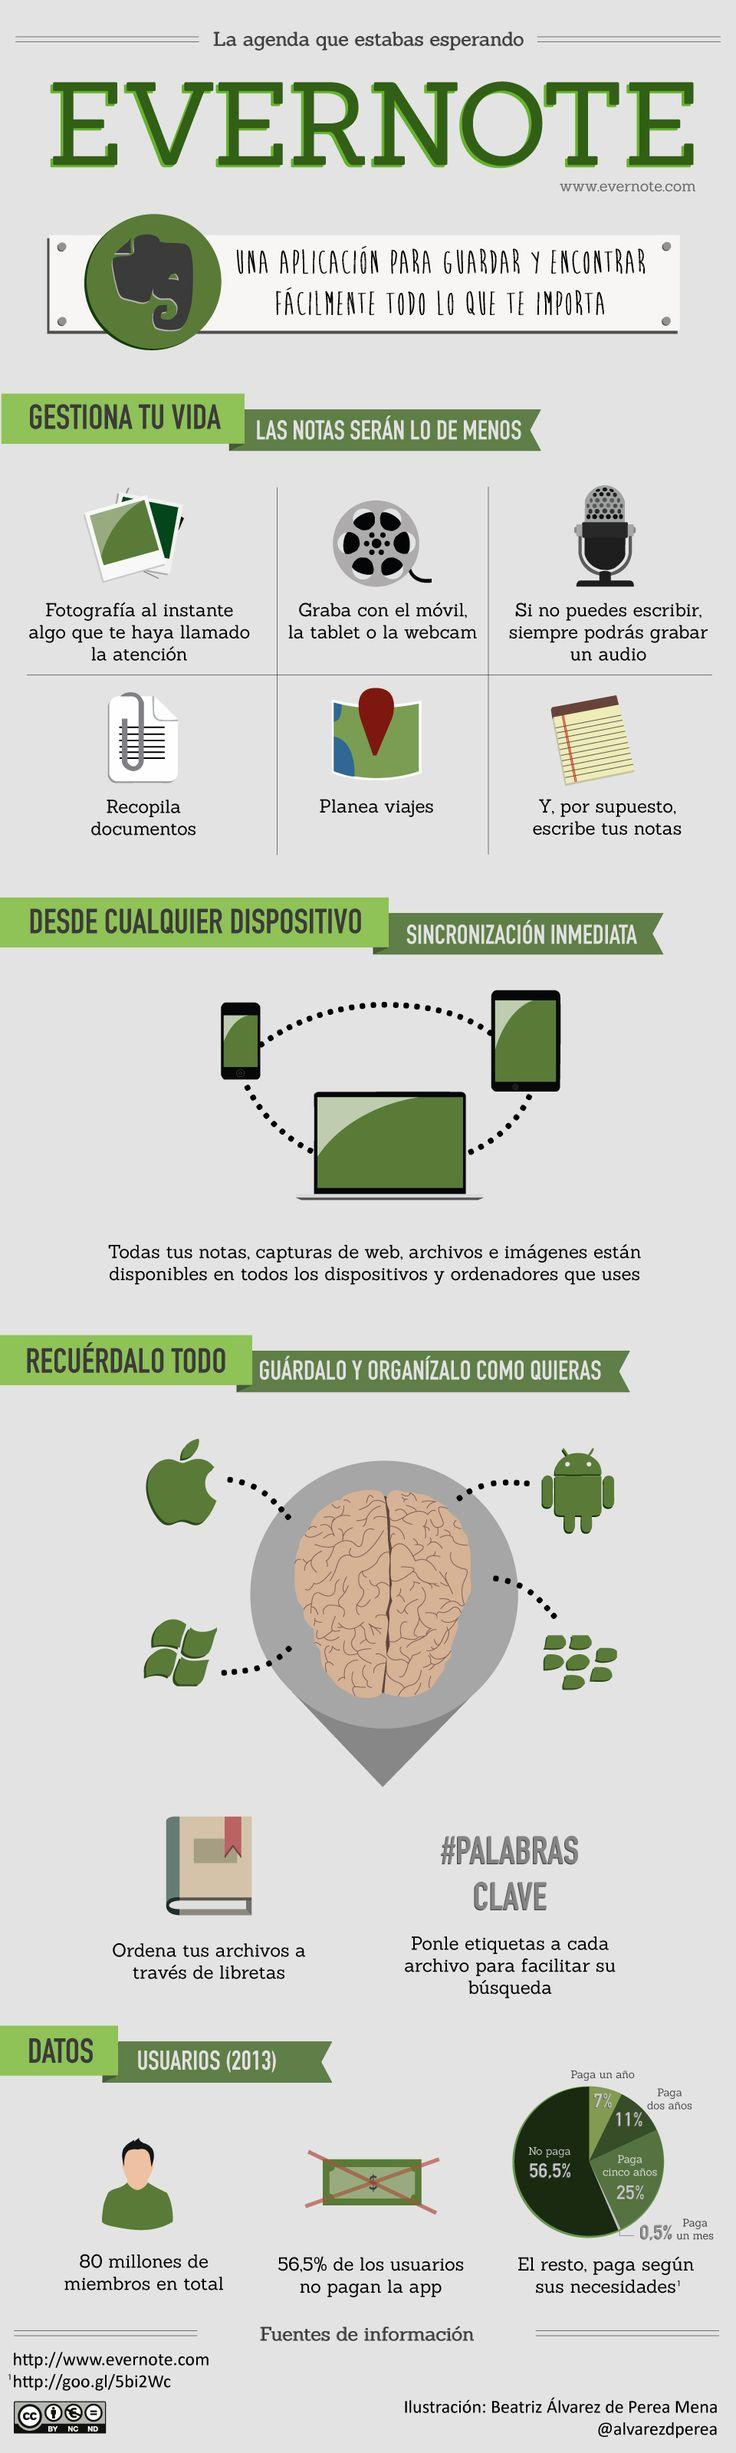 Qué es y para que sirve Evernote #infografia #infographic #internet